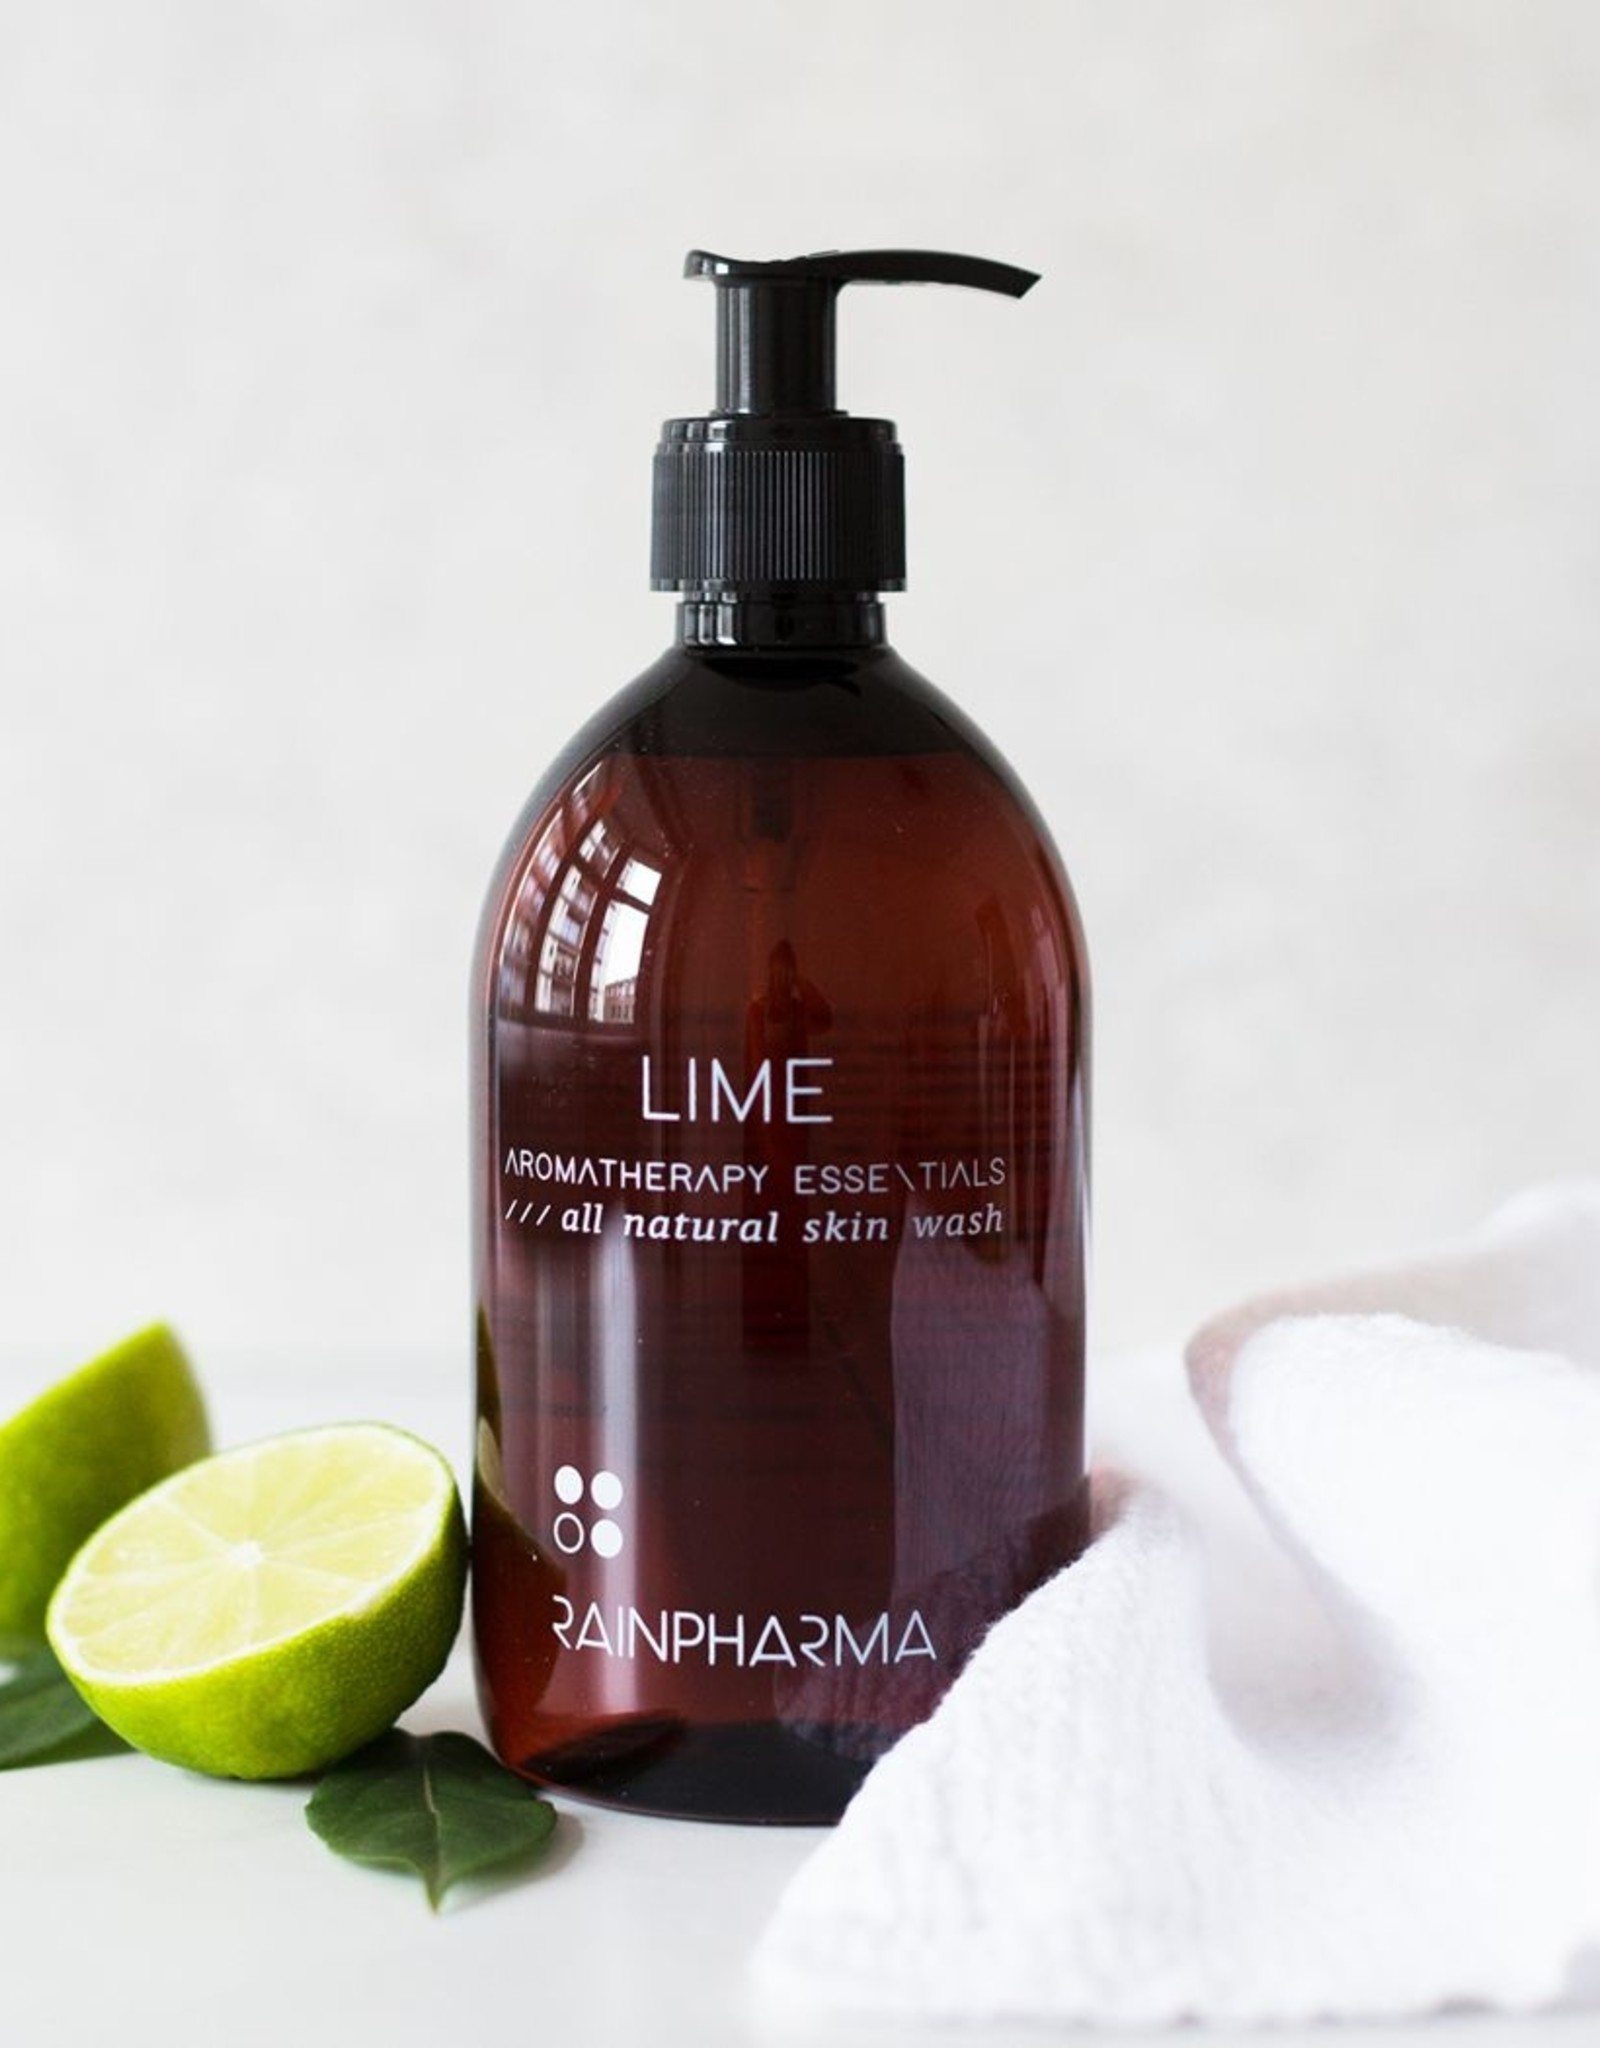 RainPharma Skin Wash Lime 500ml - Rainpharma